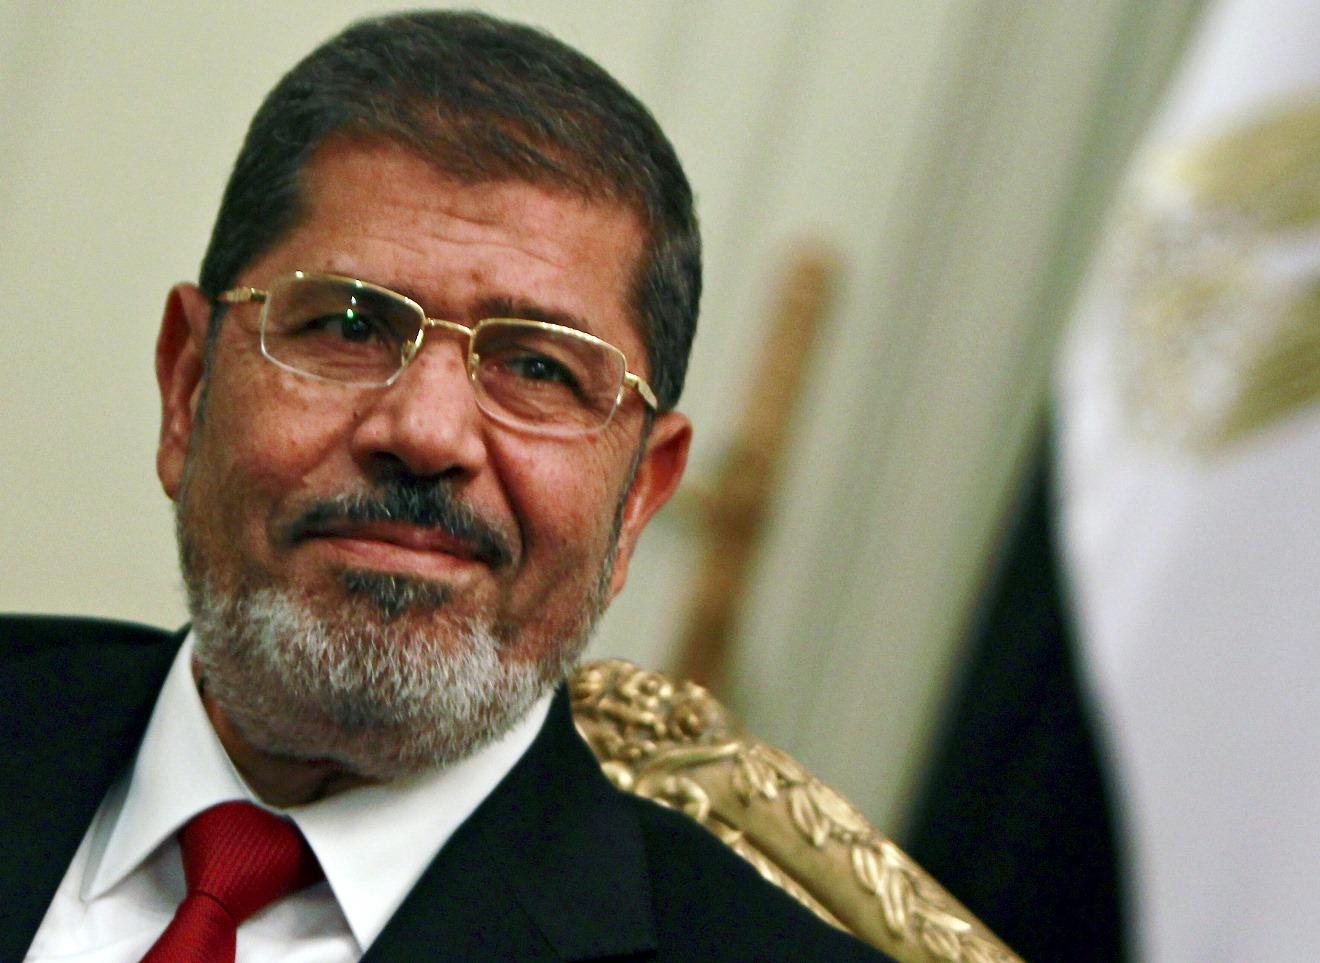 O Μοχάμεντ Μόρσι στο εδώλιο